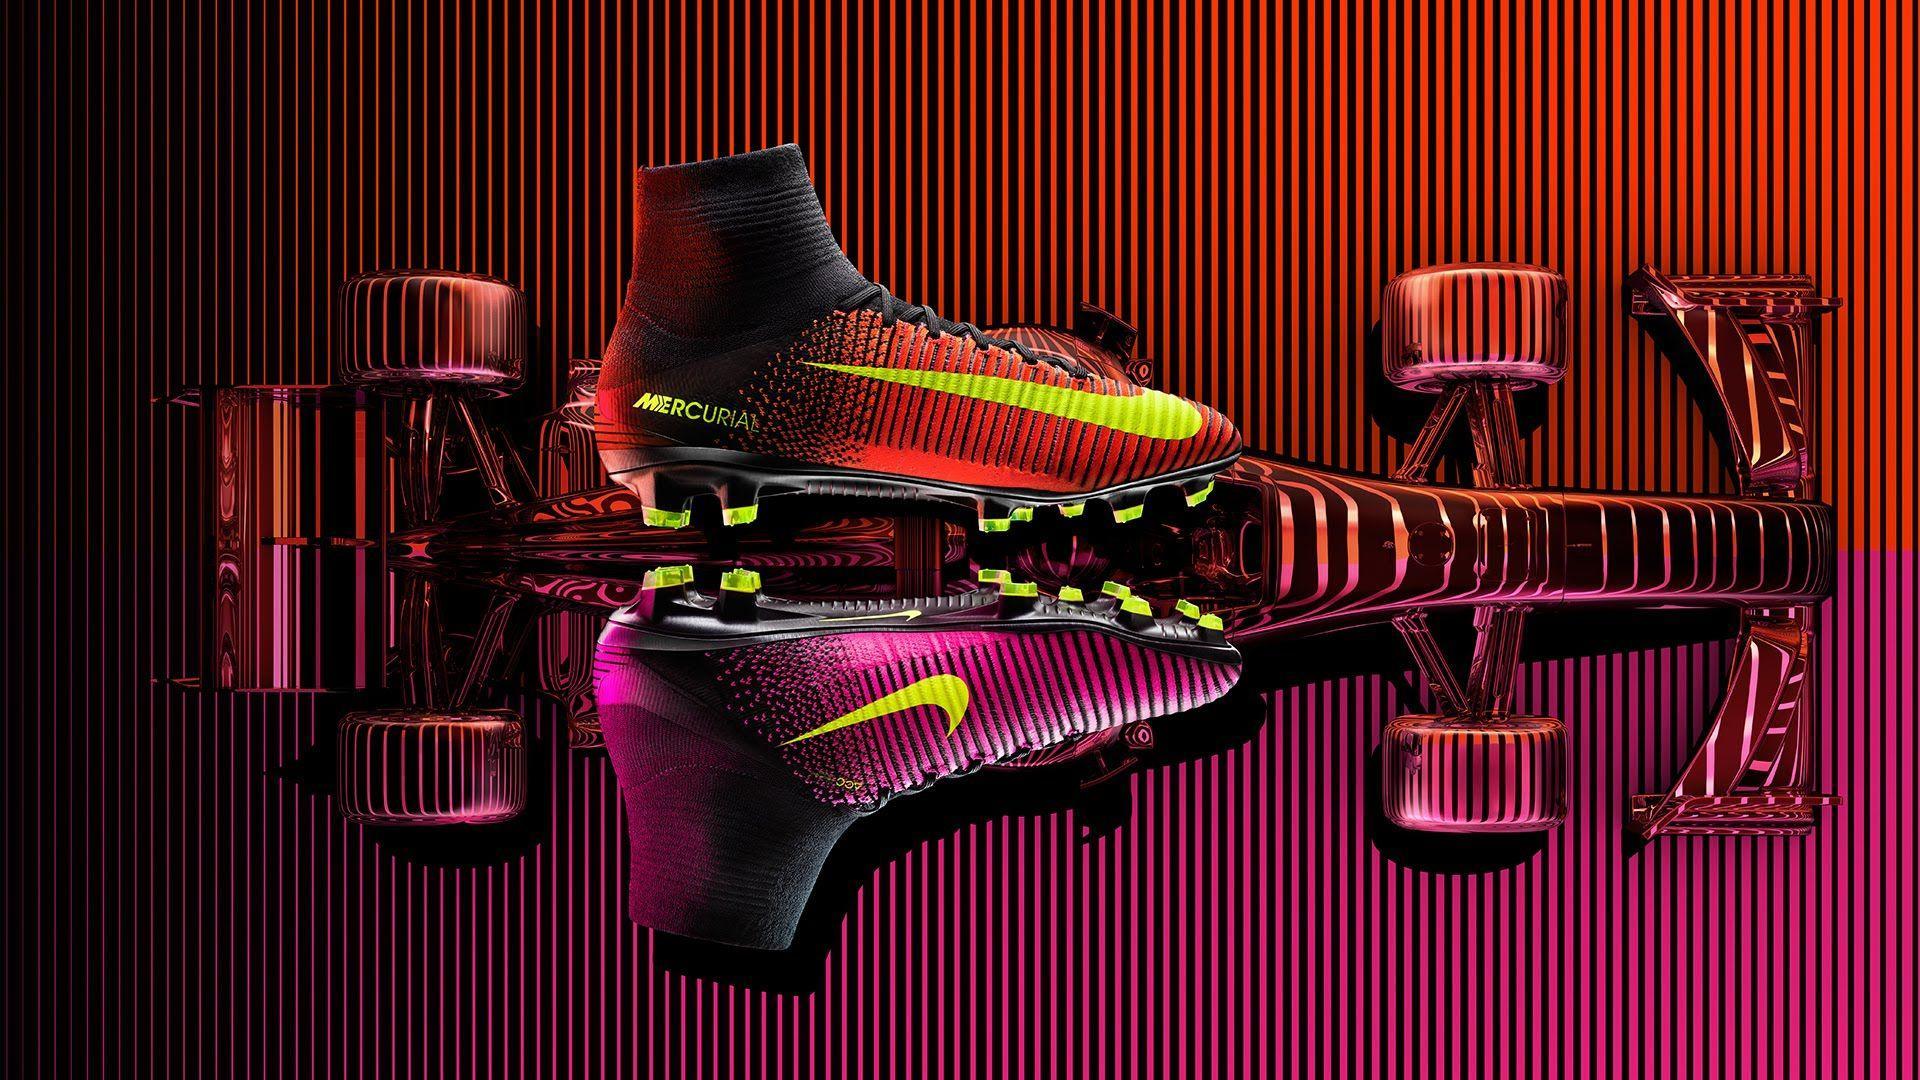 Nike Mercurial Superfly Wallpapers ...